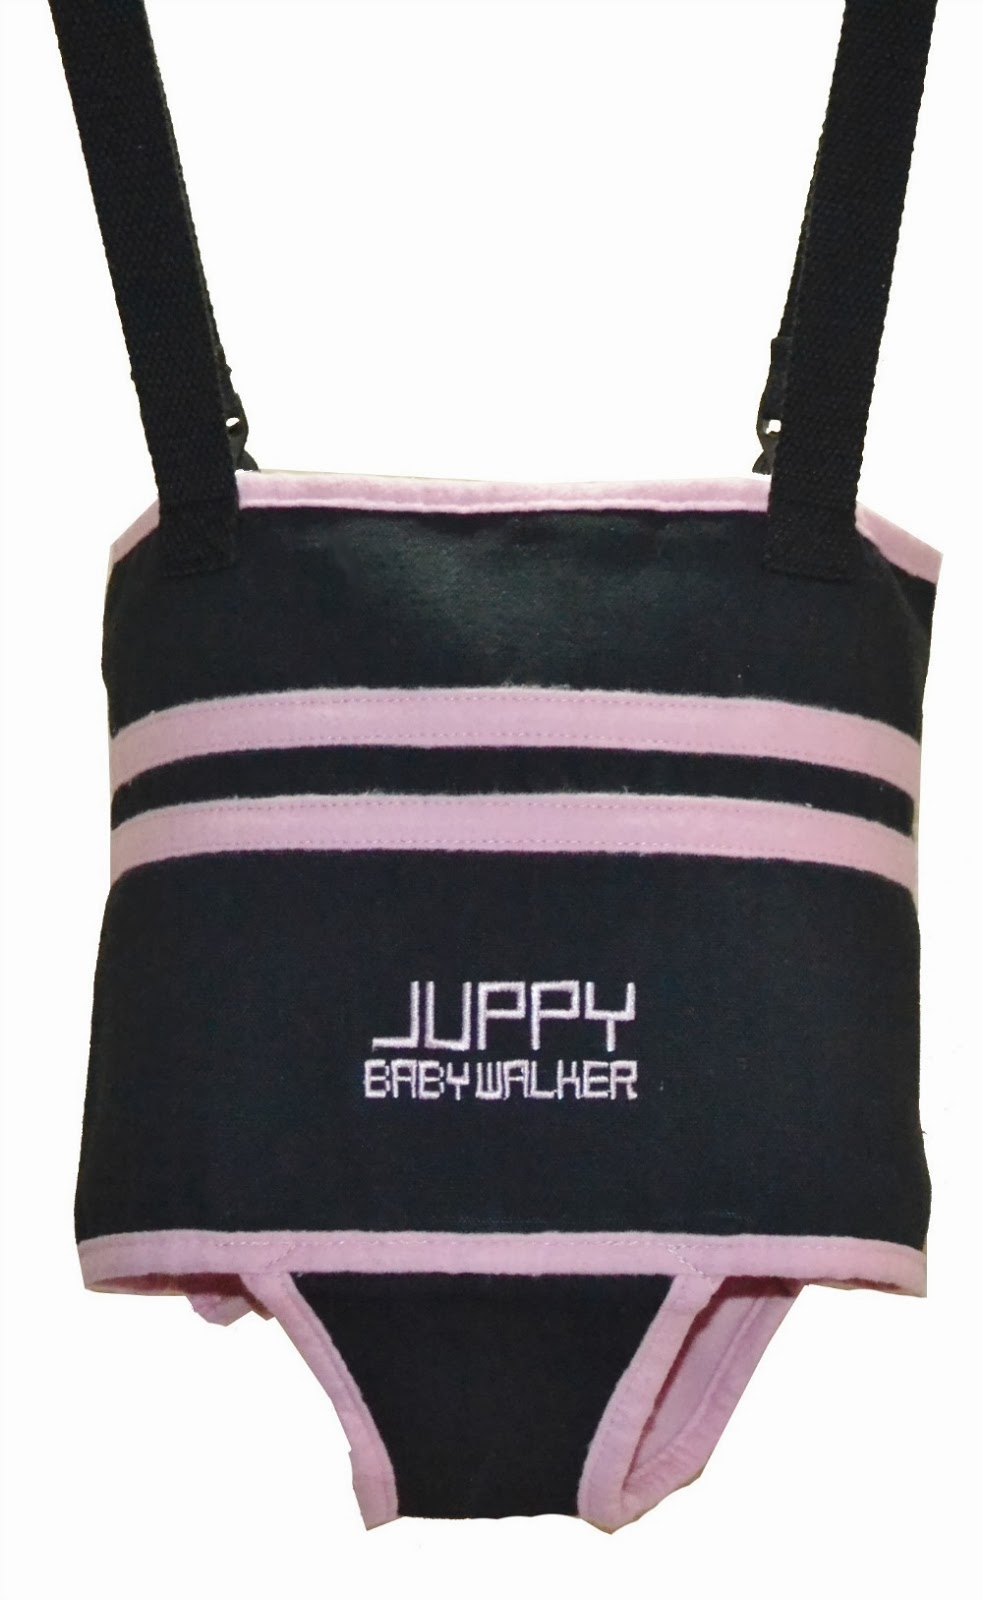 Juppy Baby Walker Momentum Review & Giveaway